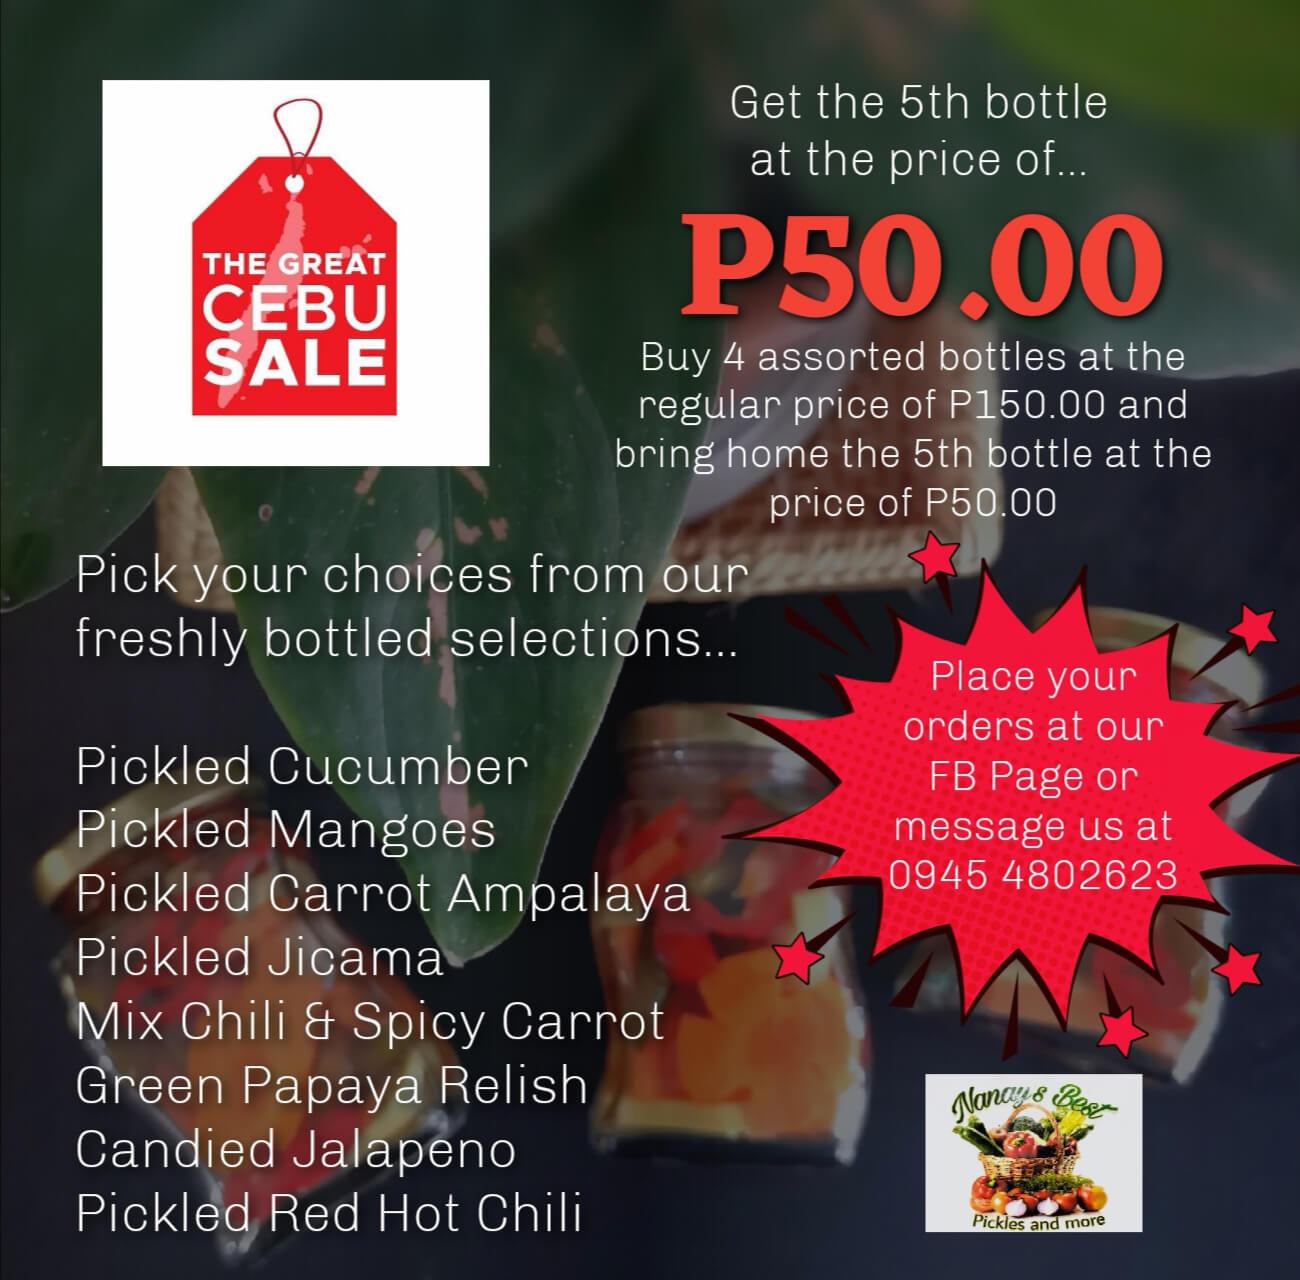 Nanay's Best offers bottled food promo